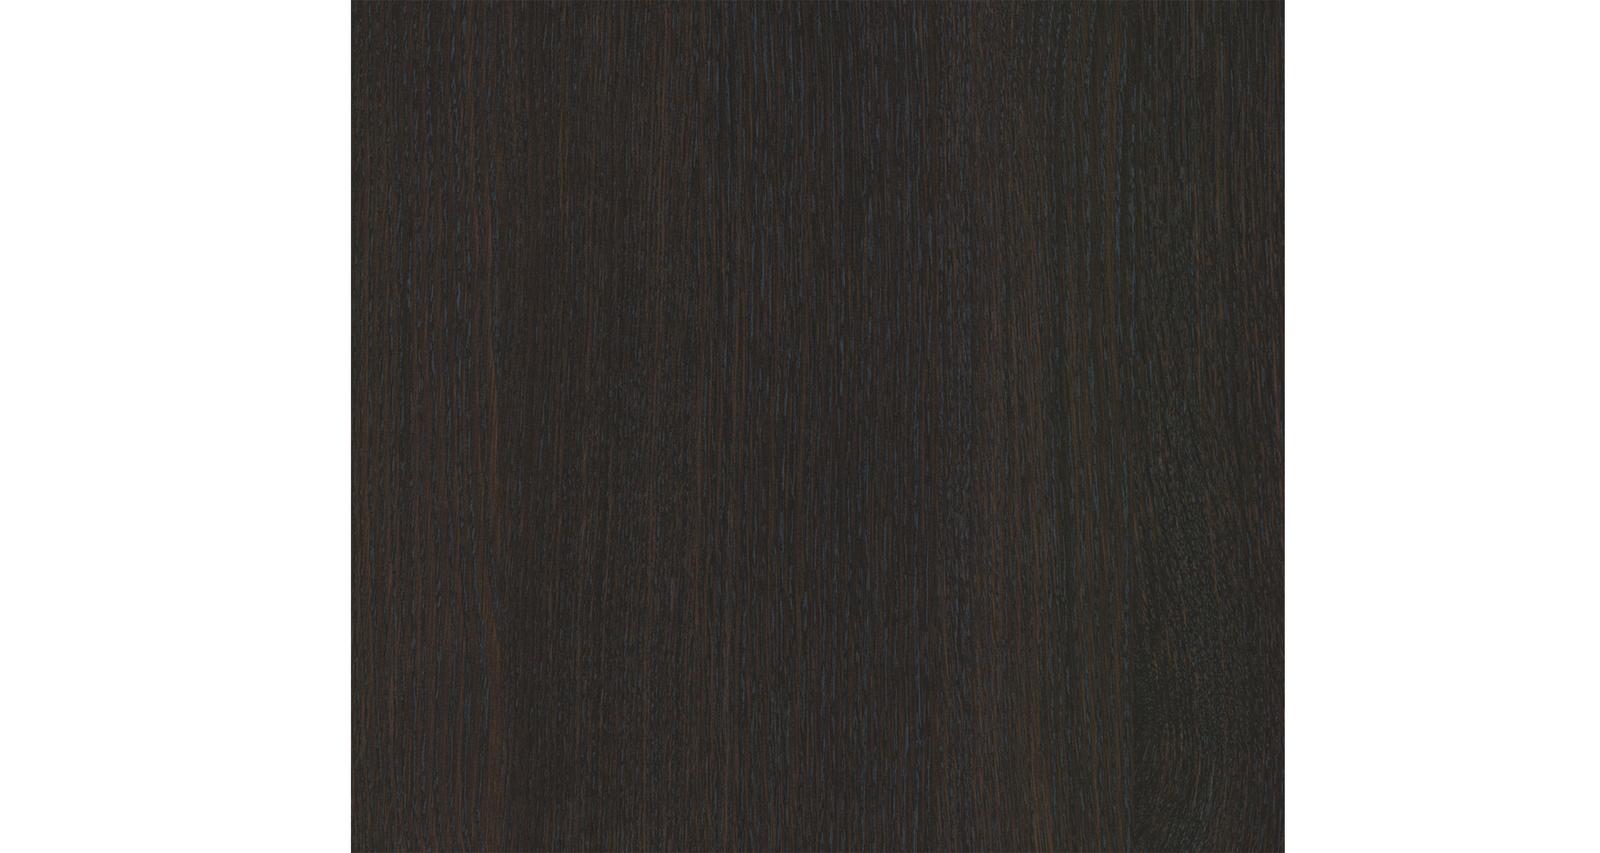 Шкаф-купе трехдверный Манчестер 234 см (дуб феррара) от HomeMe.ru